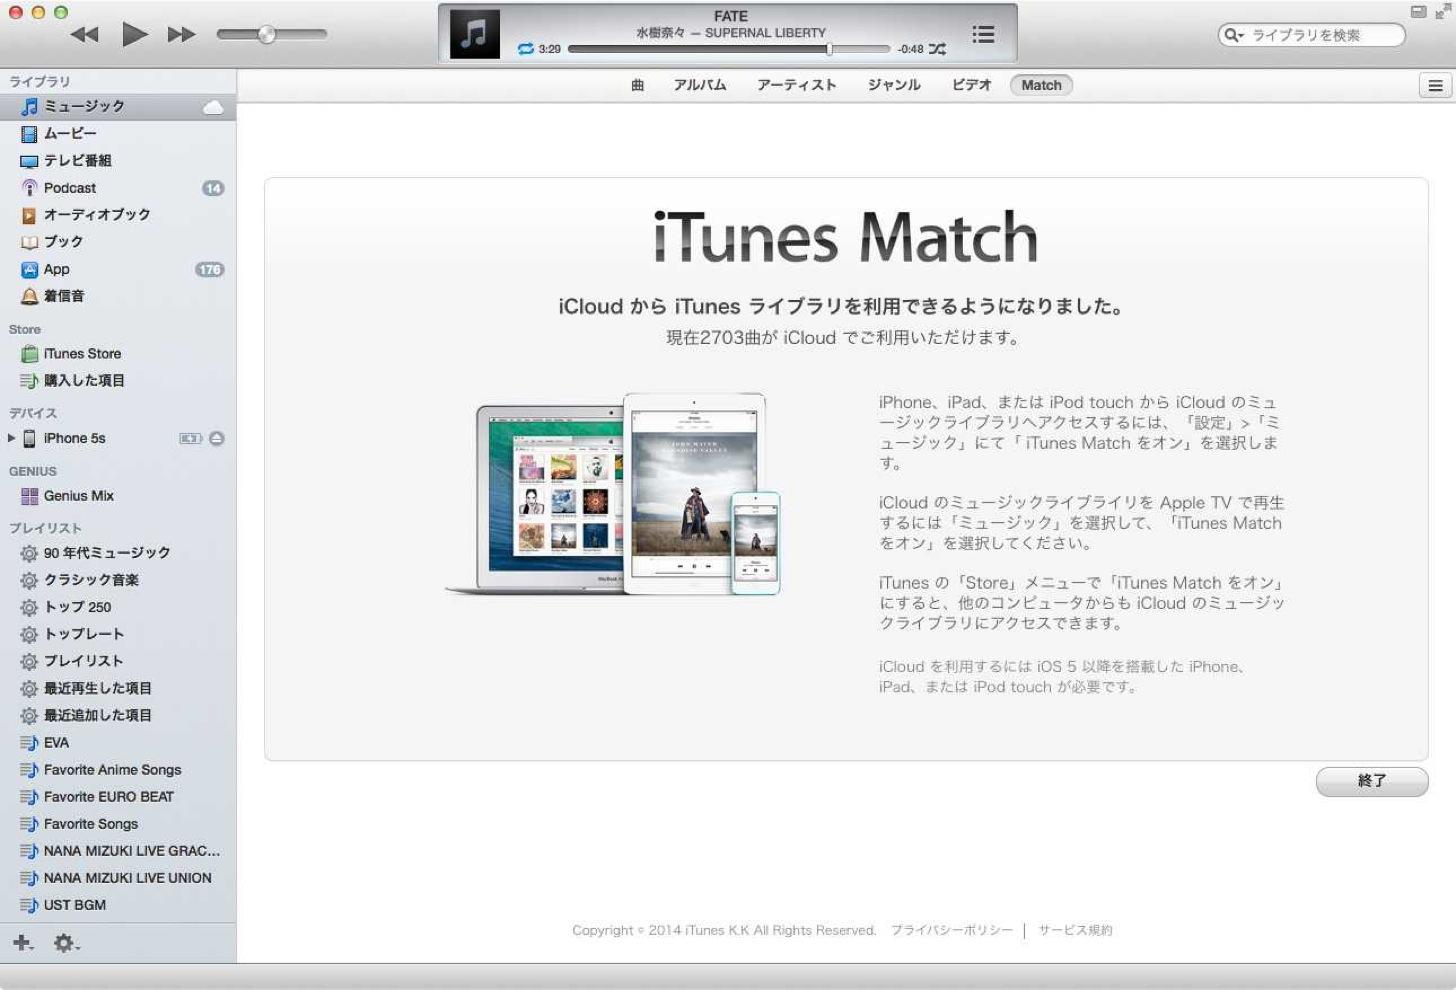 iTunes Matchの設定が完了